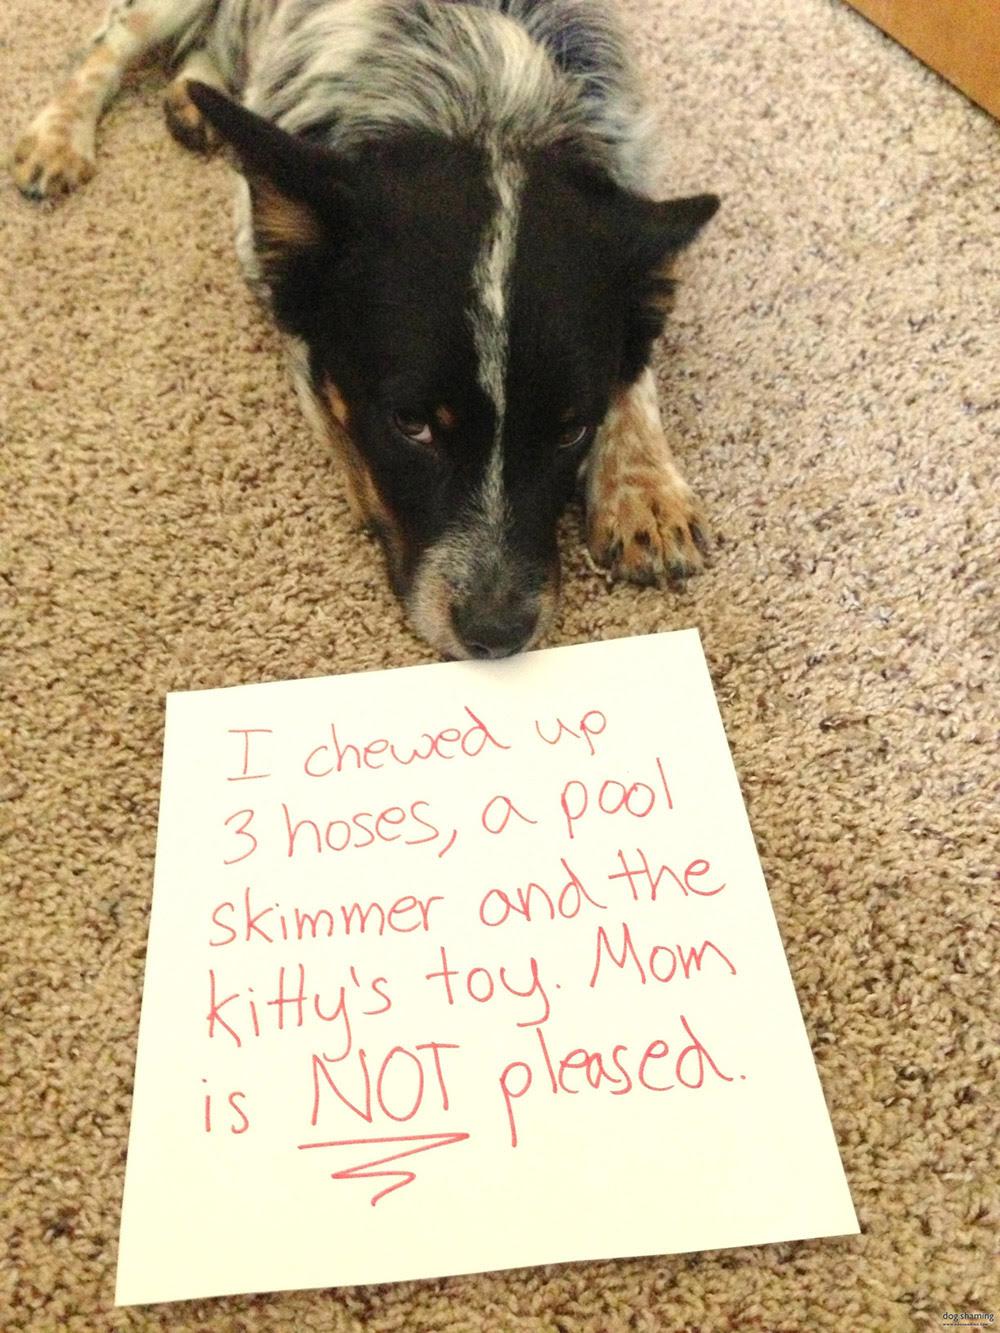 dog shaming 09 32 Hillarious Public Shaming of Dogs